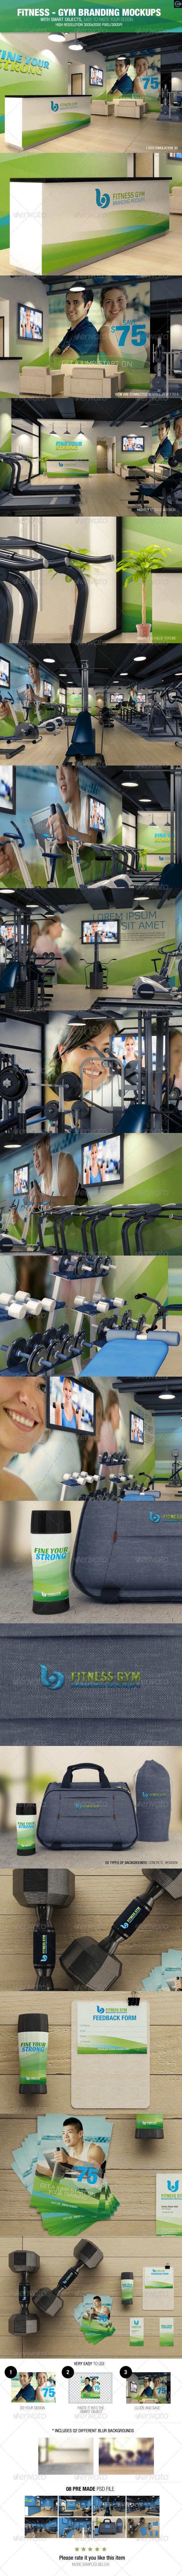 GraphicRiver Fitness Gym Branding Mockups 8329238